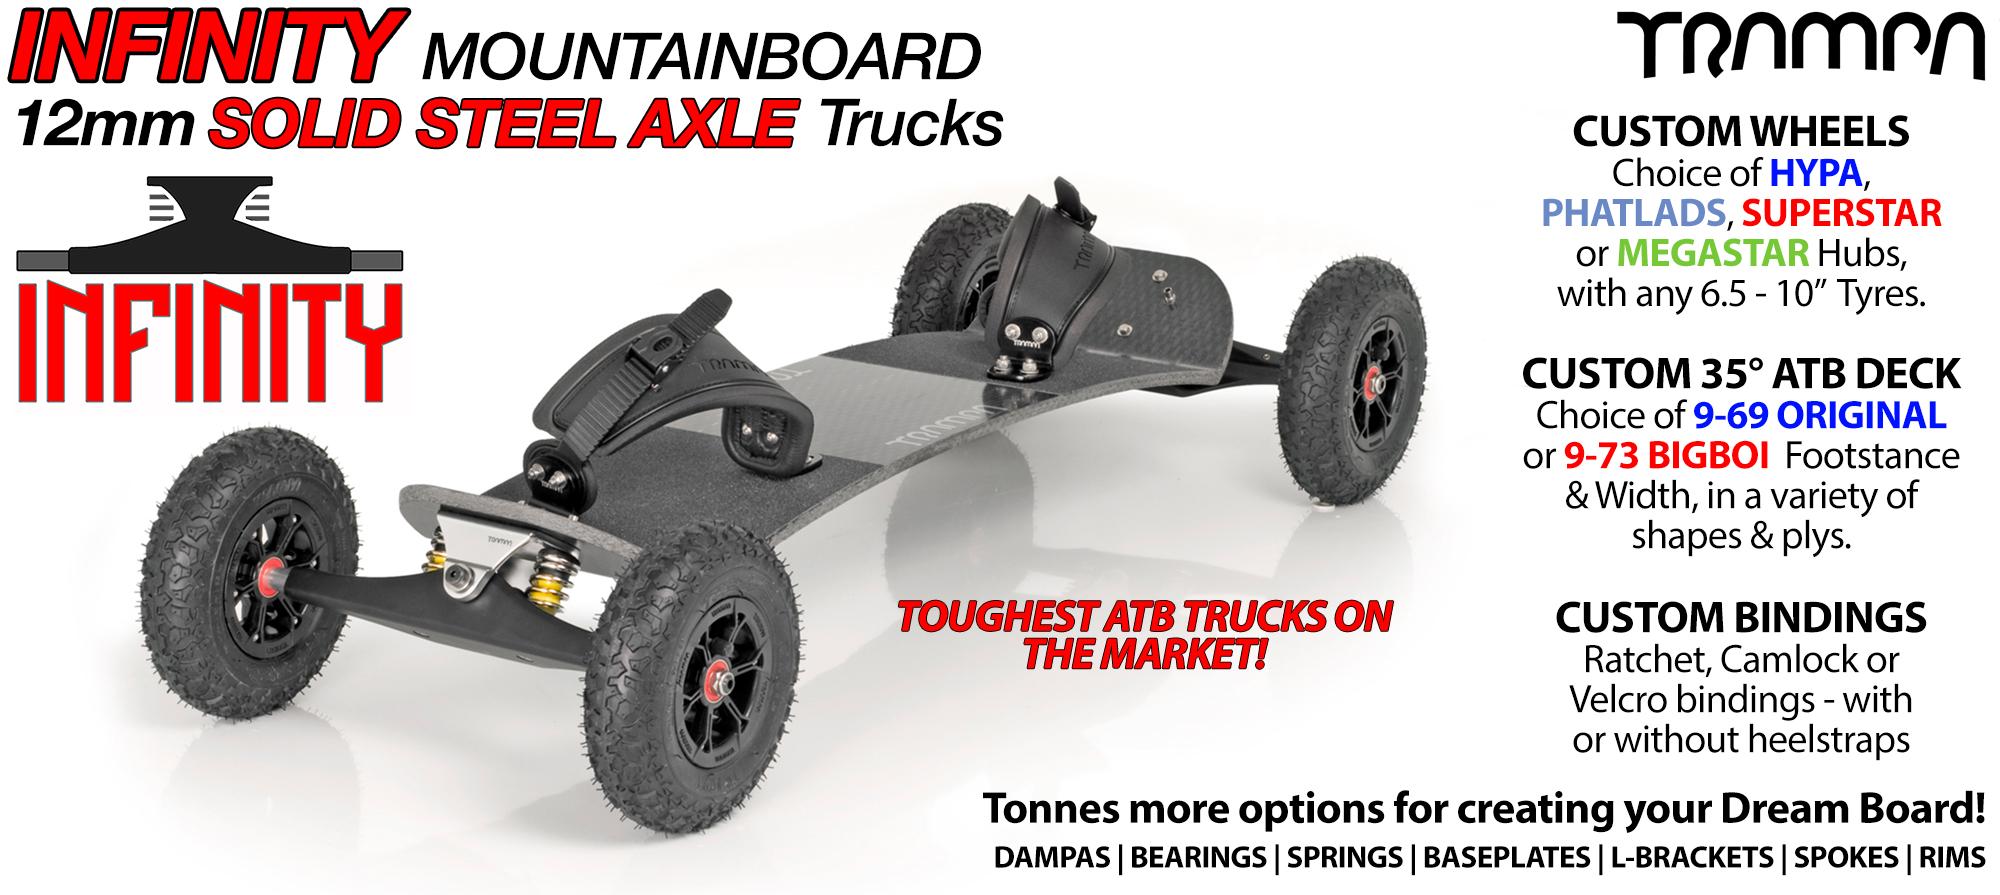 TRAMPA Mountainboard with 12mm SOLID Axle INFINITY Trucks RATCHET Bindings & Custom Wheels